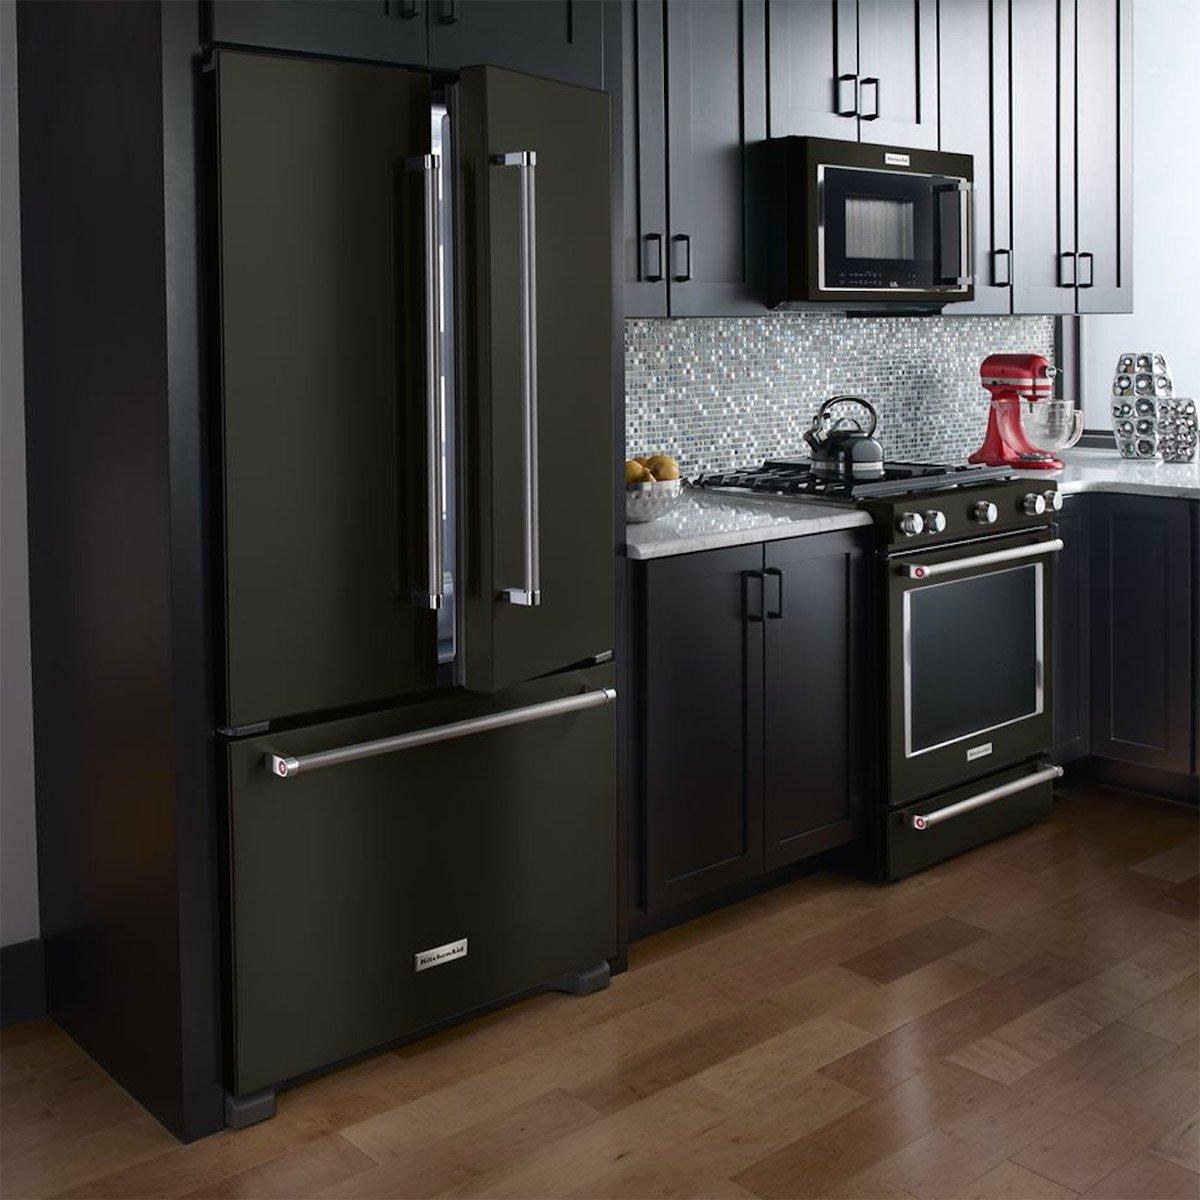 Black Friday Sale 2019 - Kenmore Side by Side Refrigerator